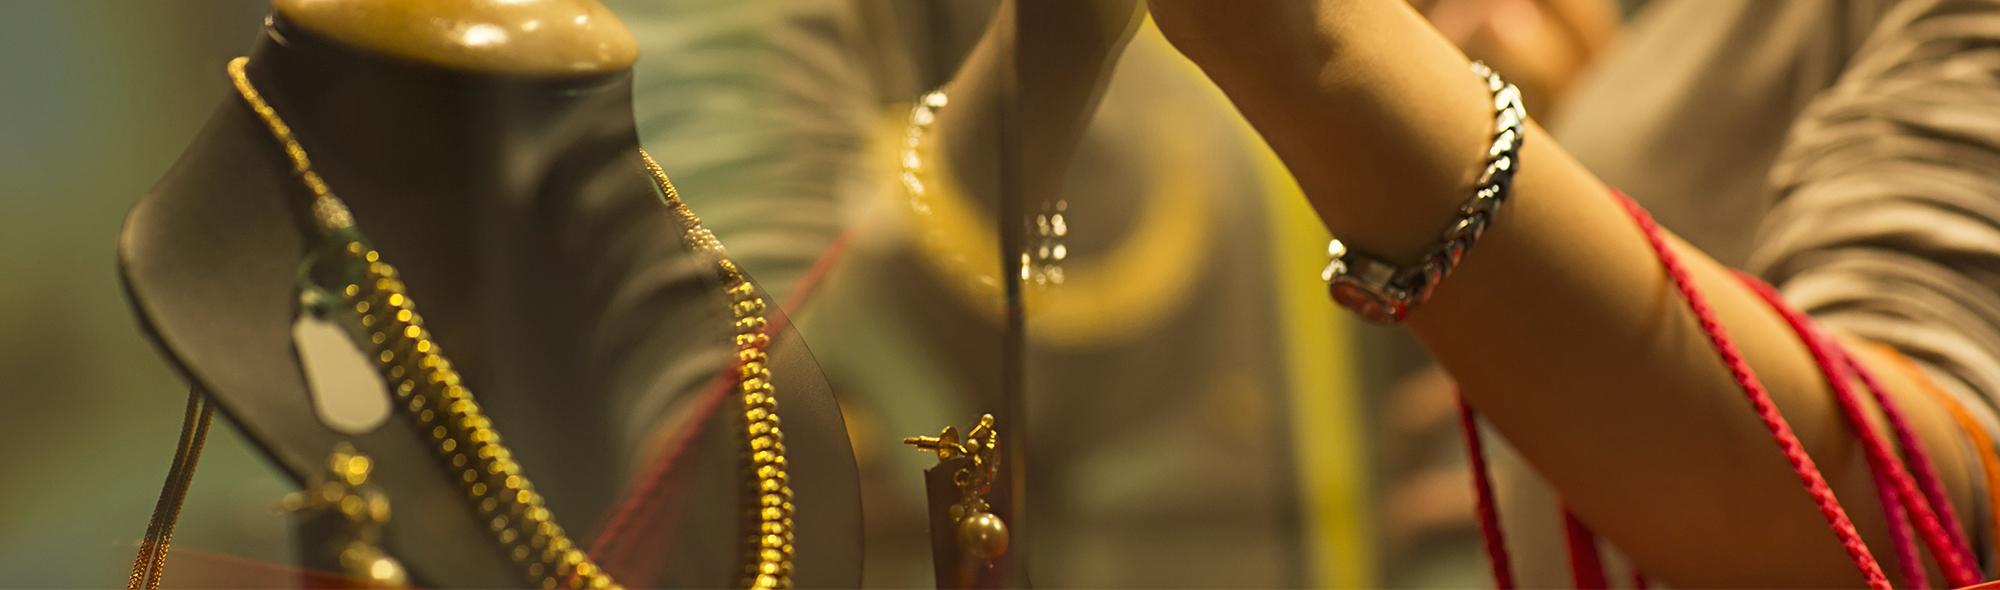 Gold Monetisation Scheme- A Great Investment Option